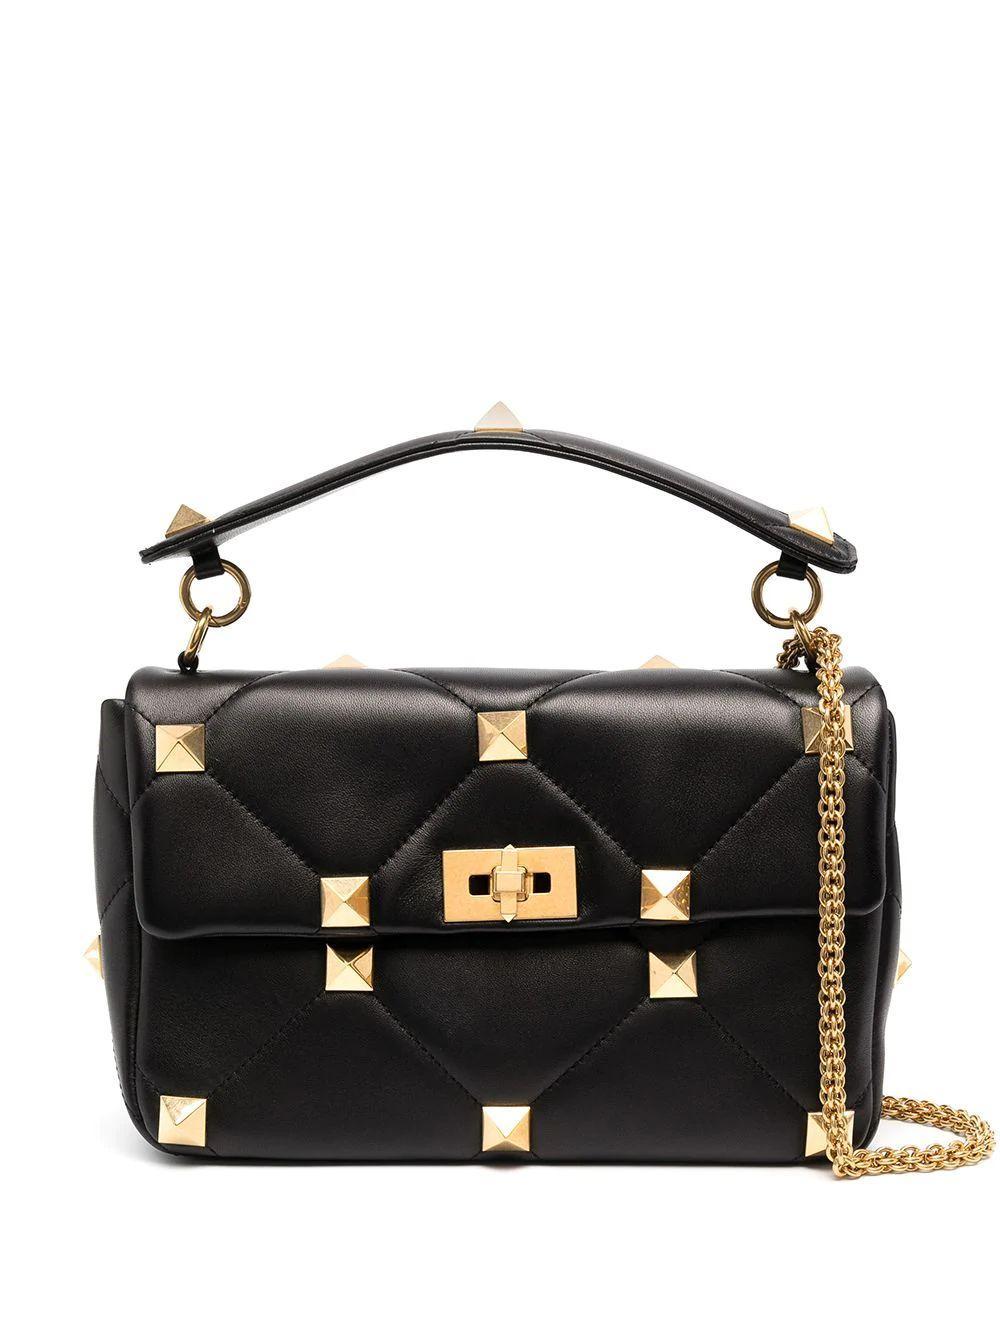 Roman Stud Chain Bag